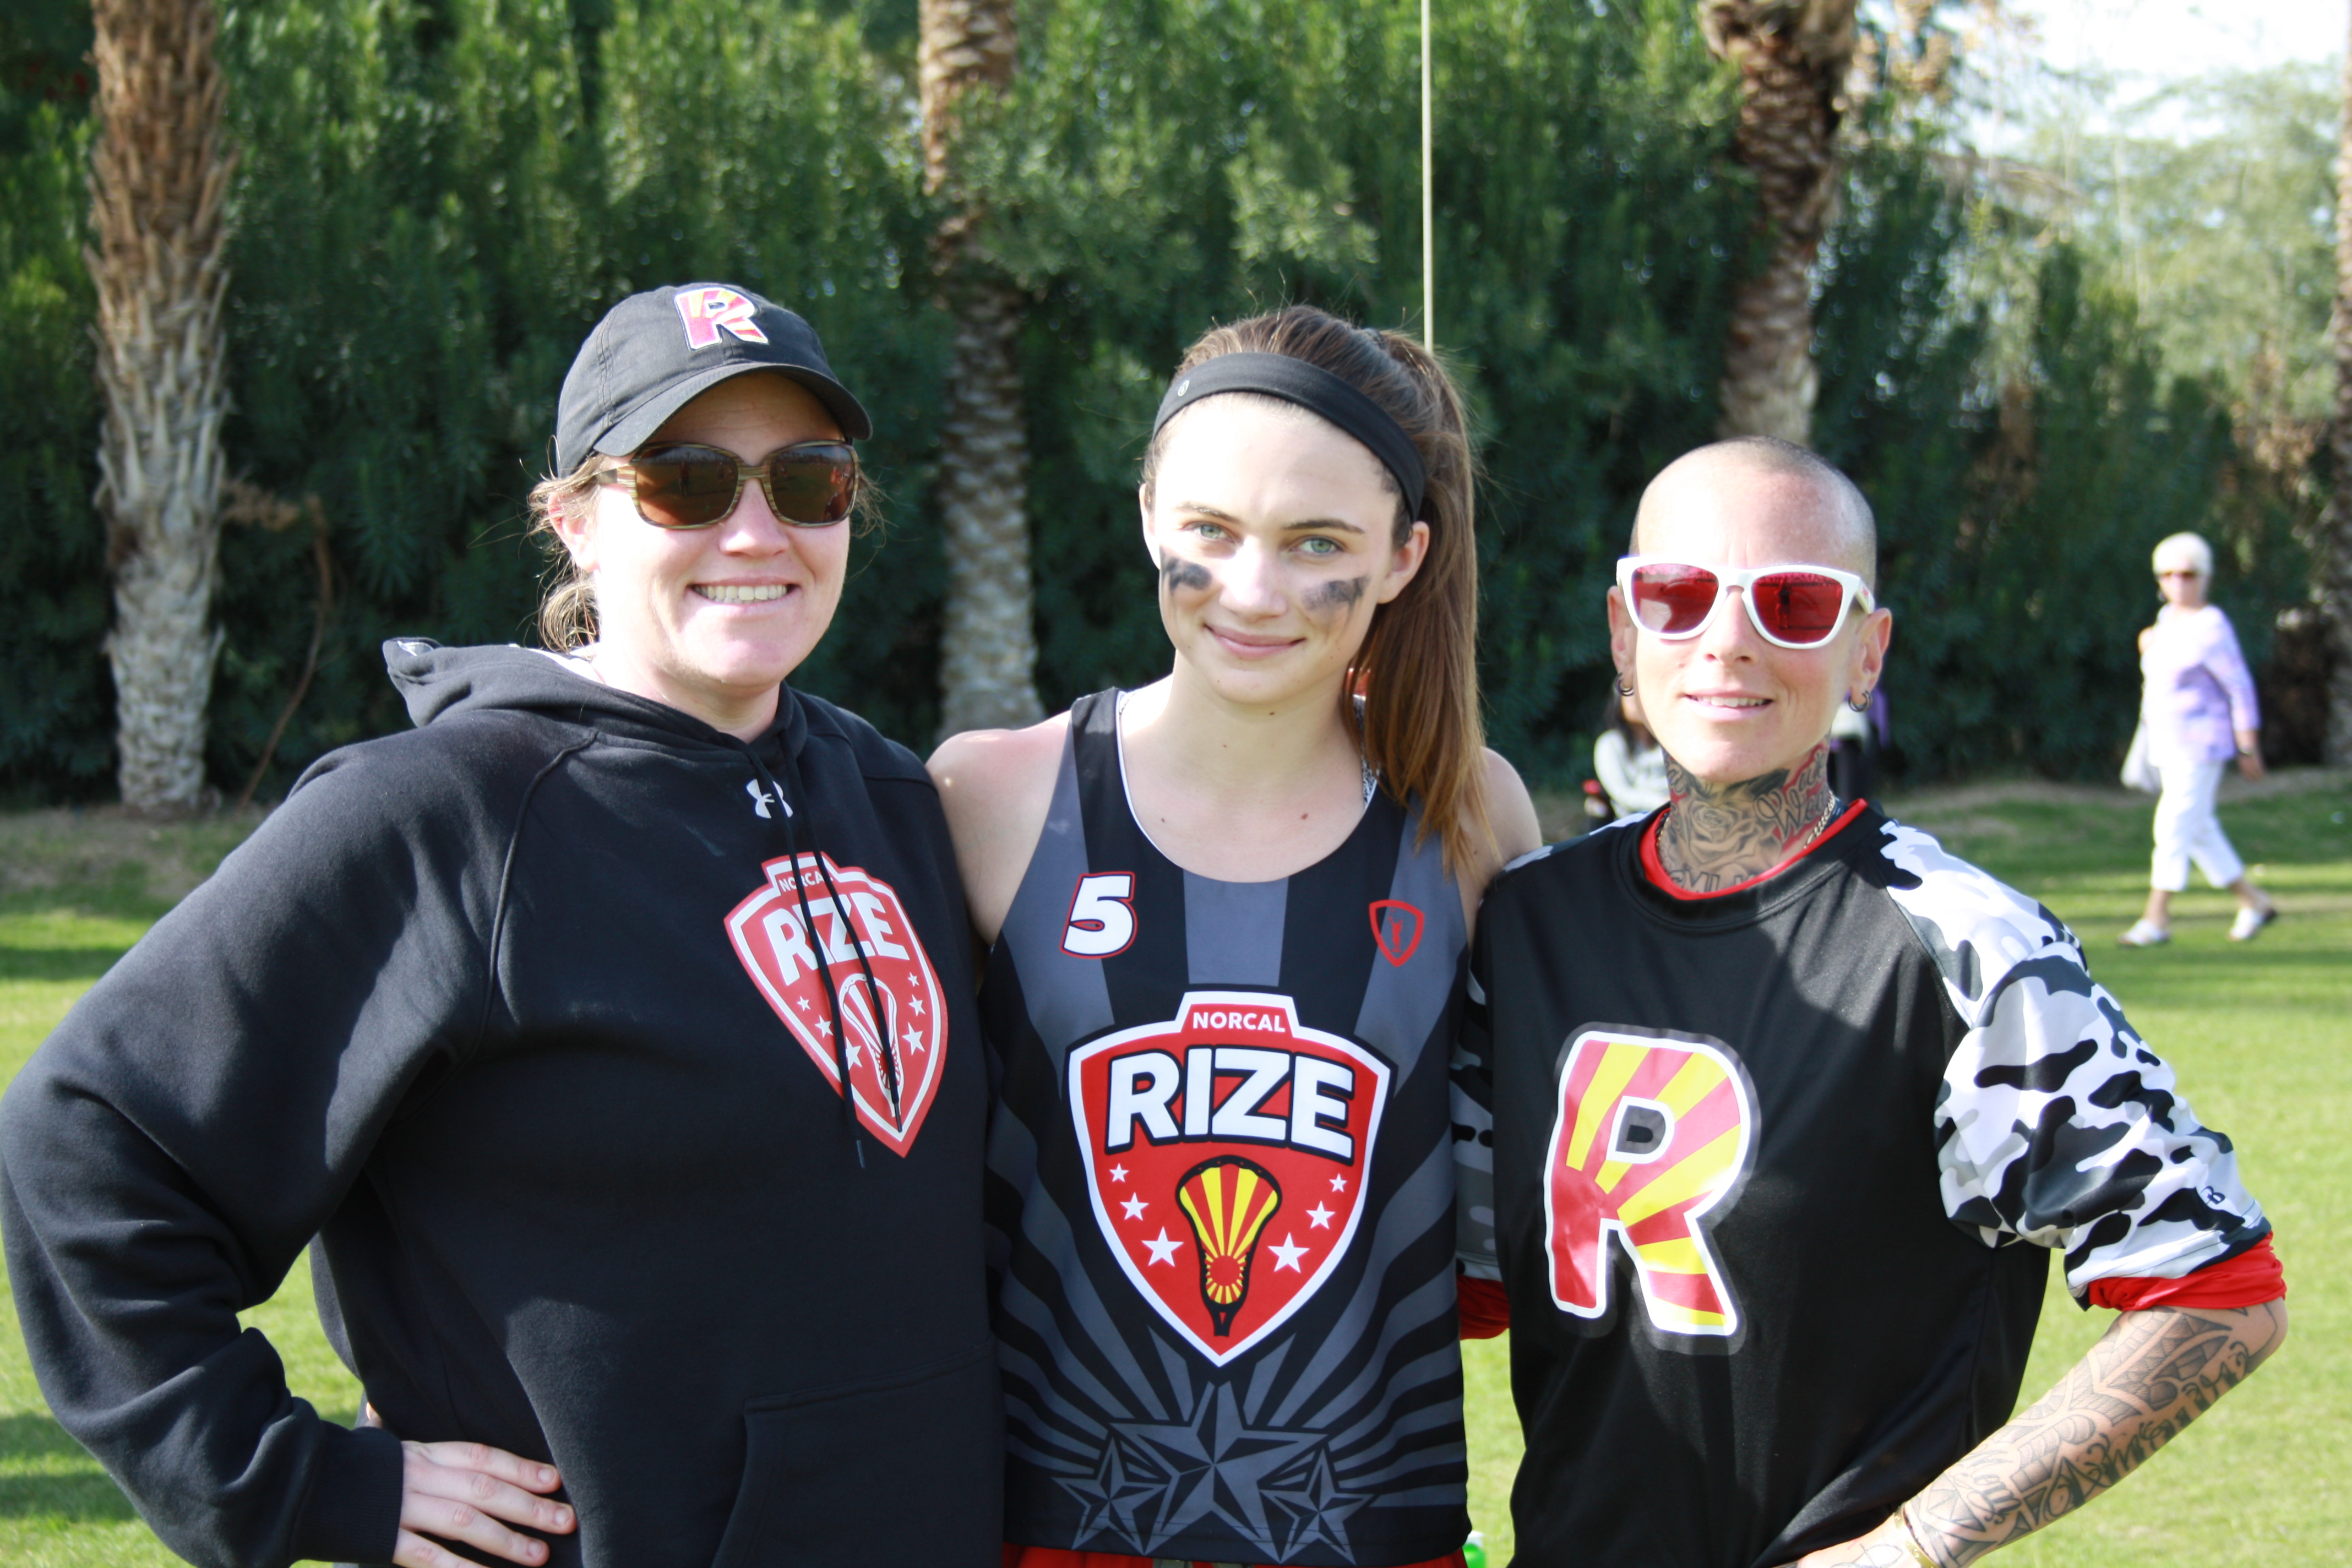 Coaches - NorCal RIZE, LLC - Girls' Lacrosse Community